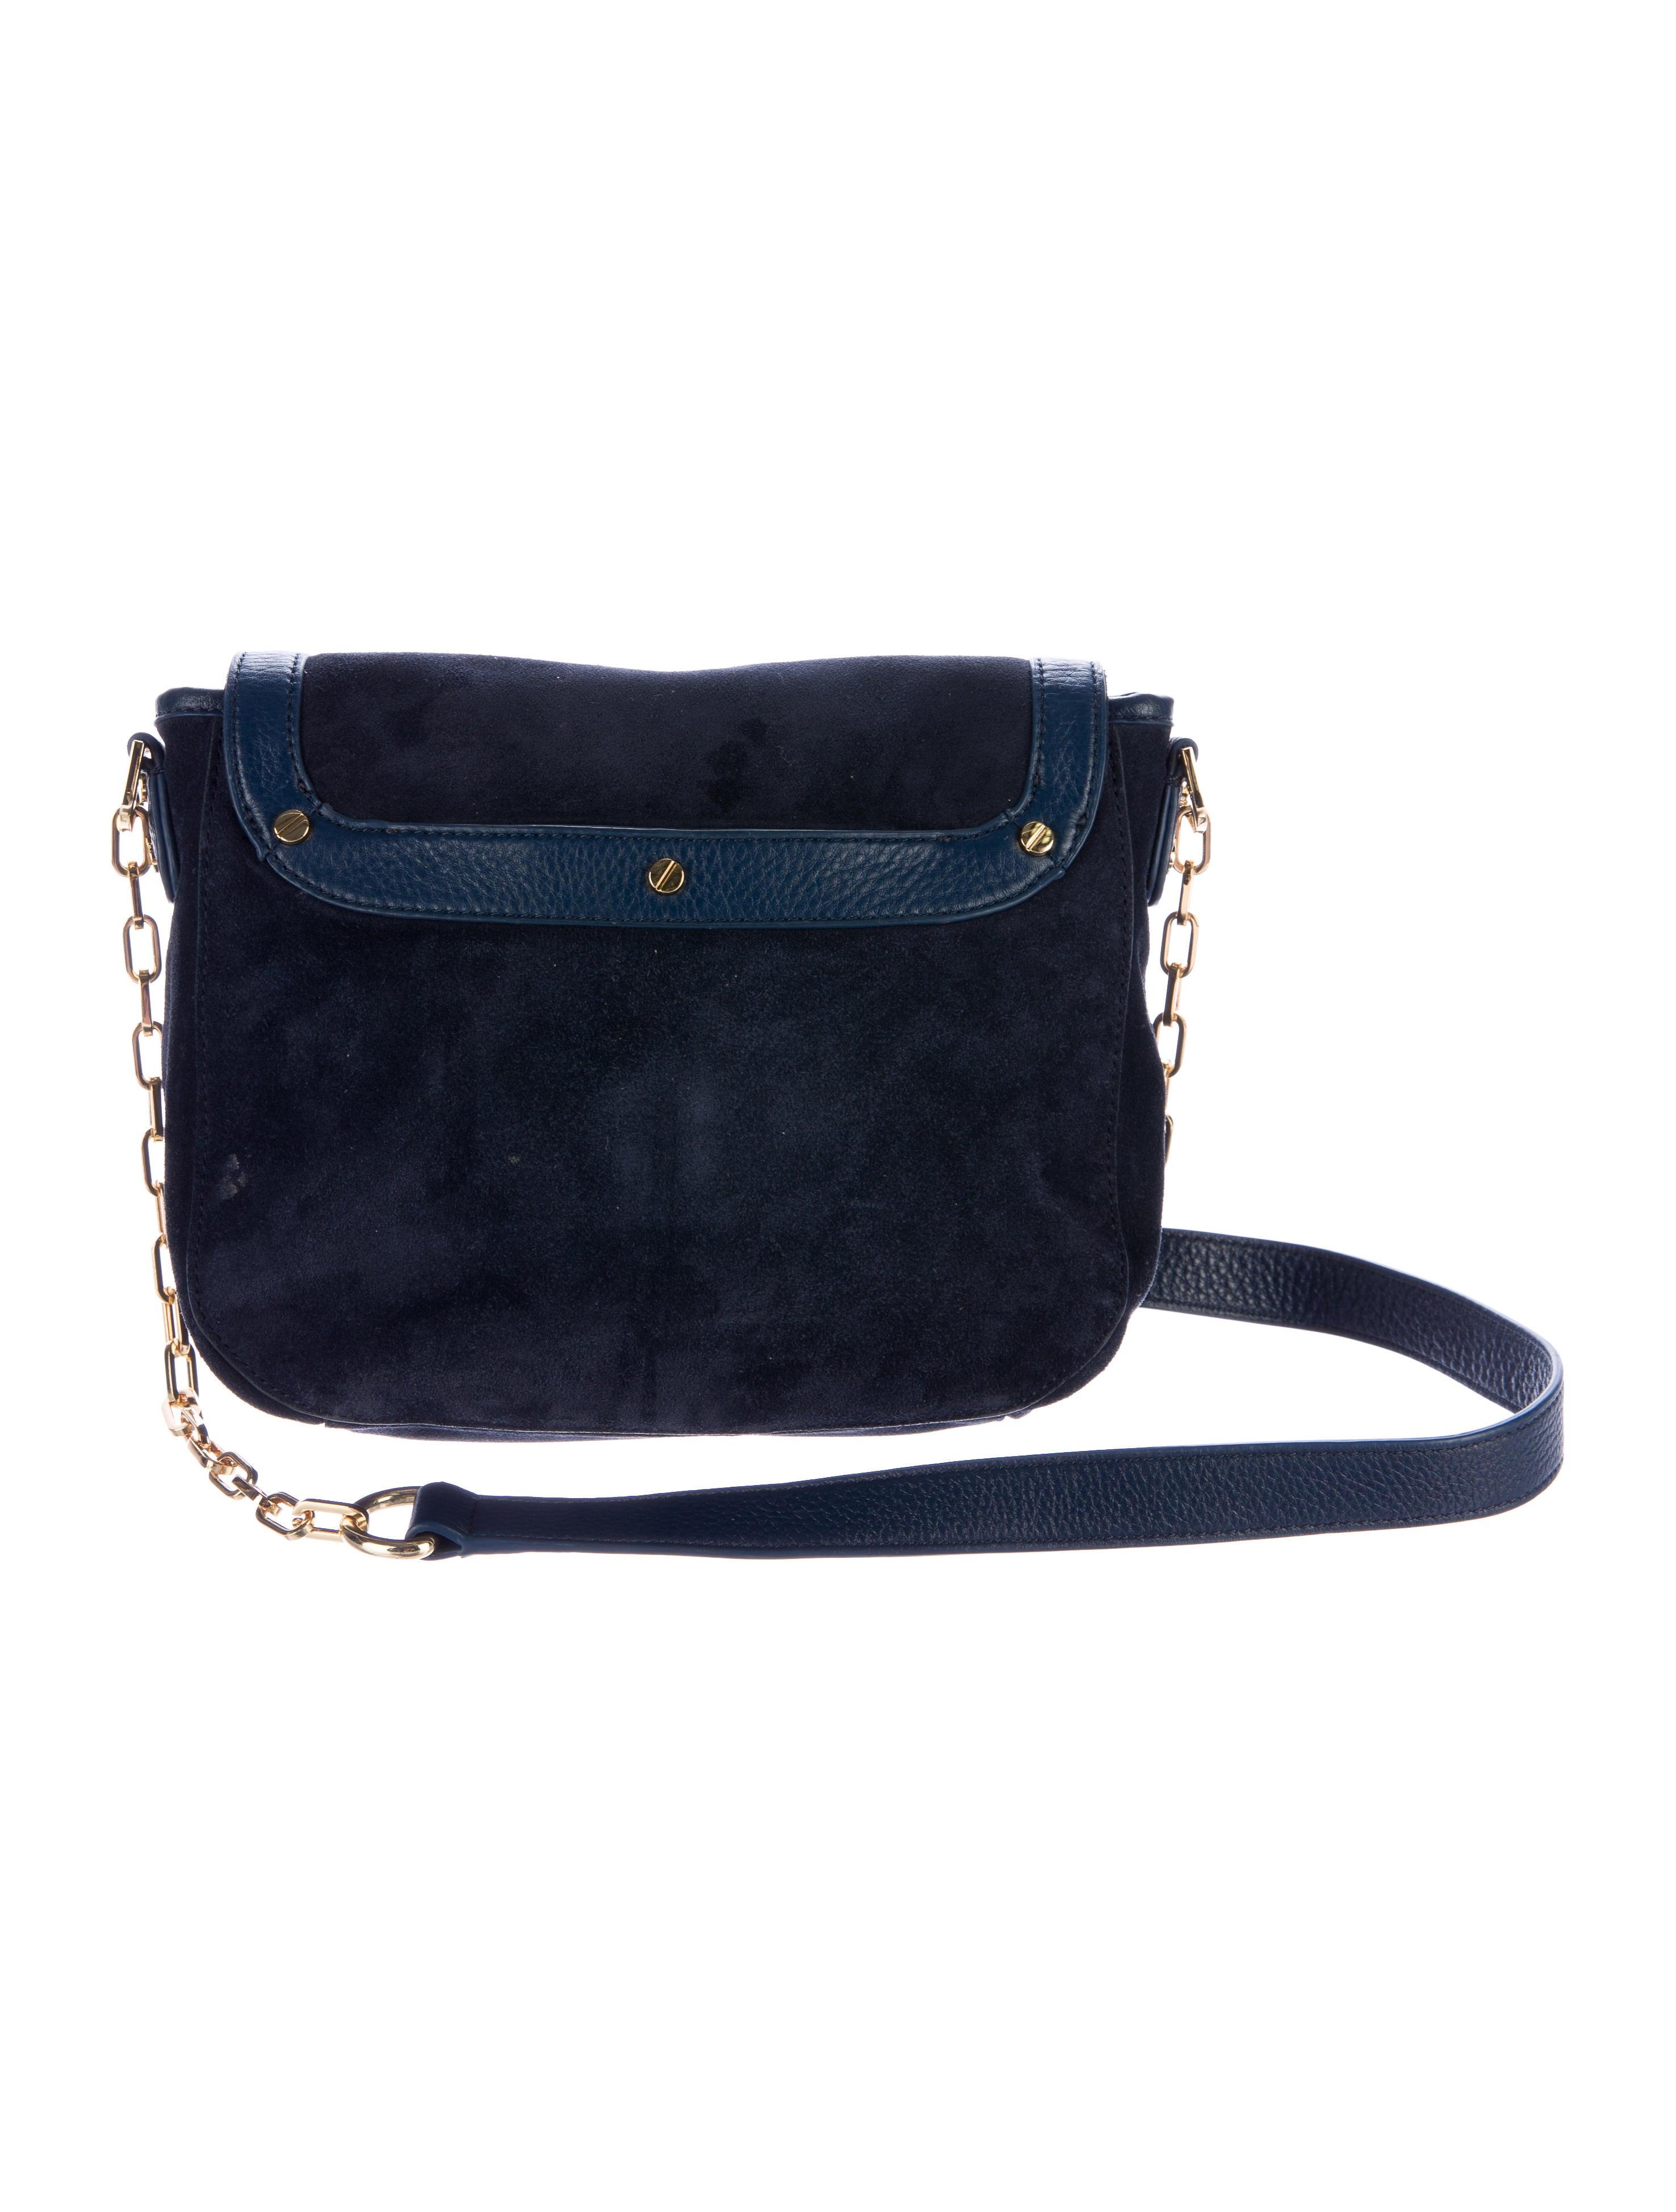 Tory Burch Amanda Suede Crossbody Bag Handbags